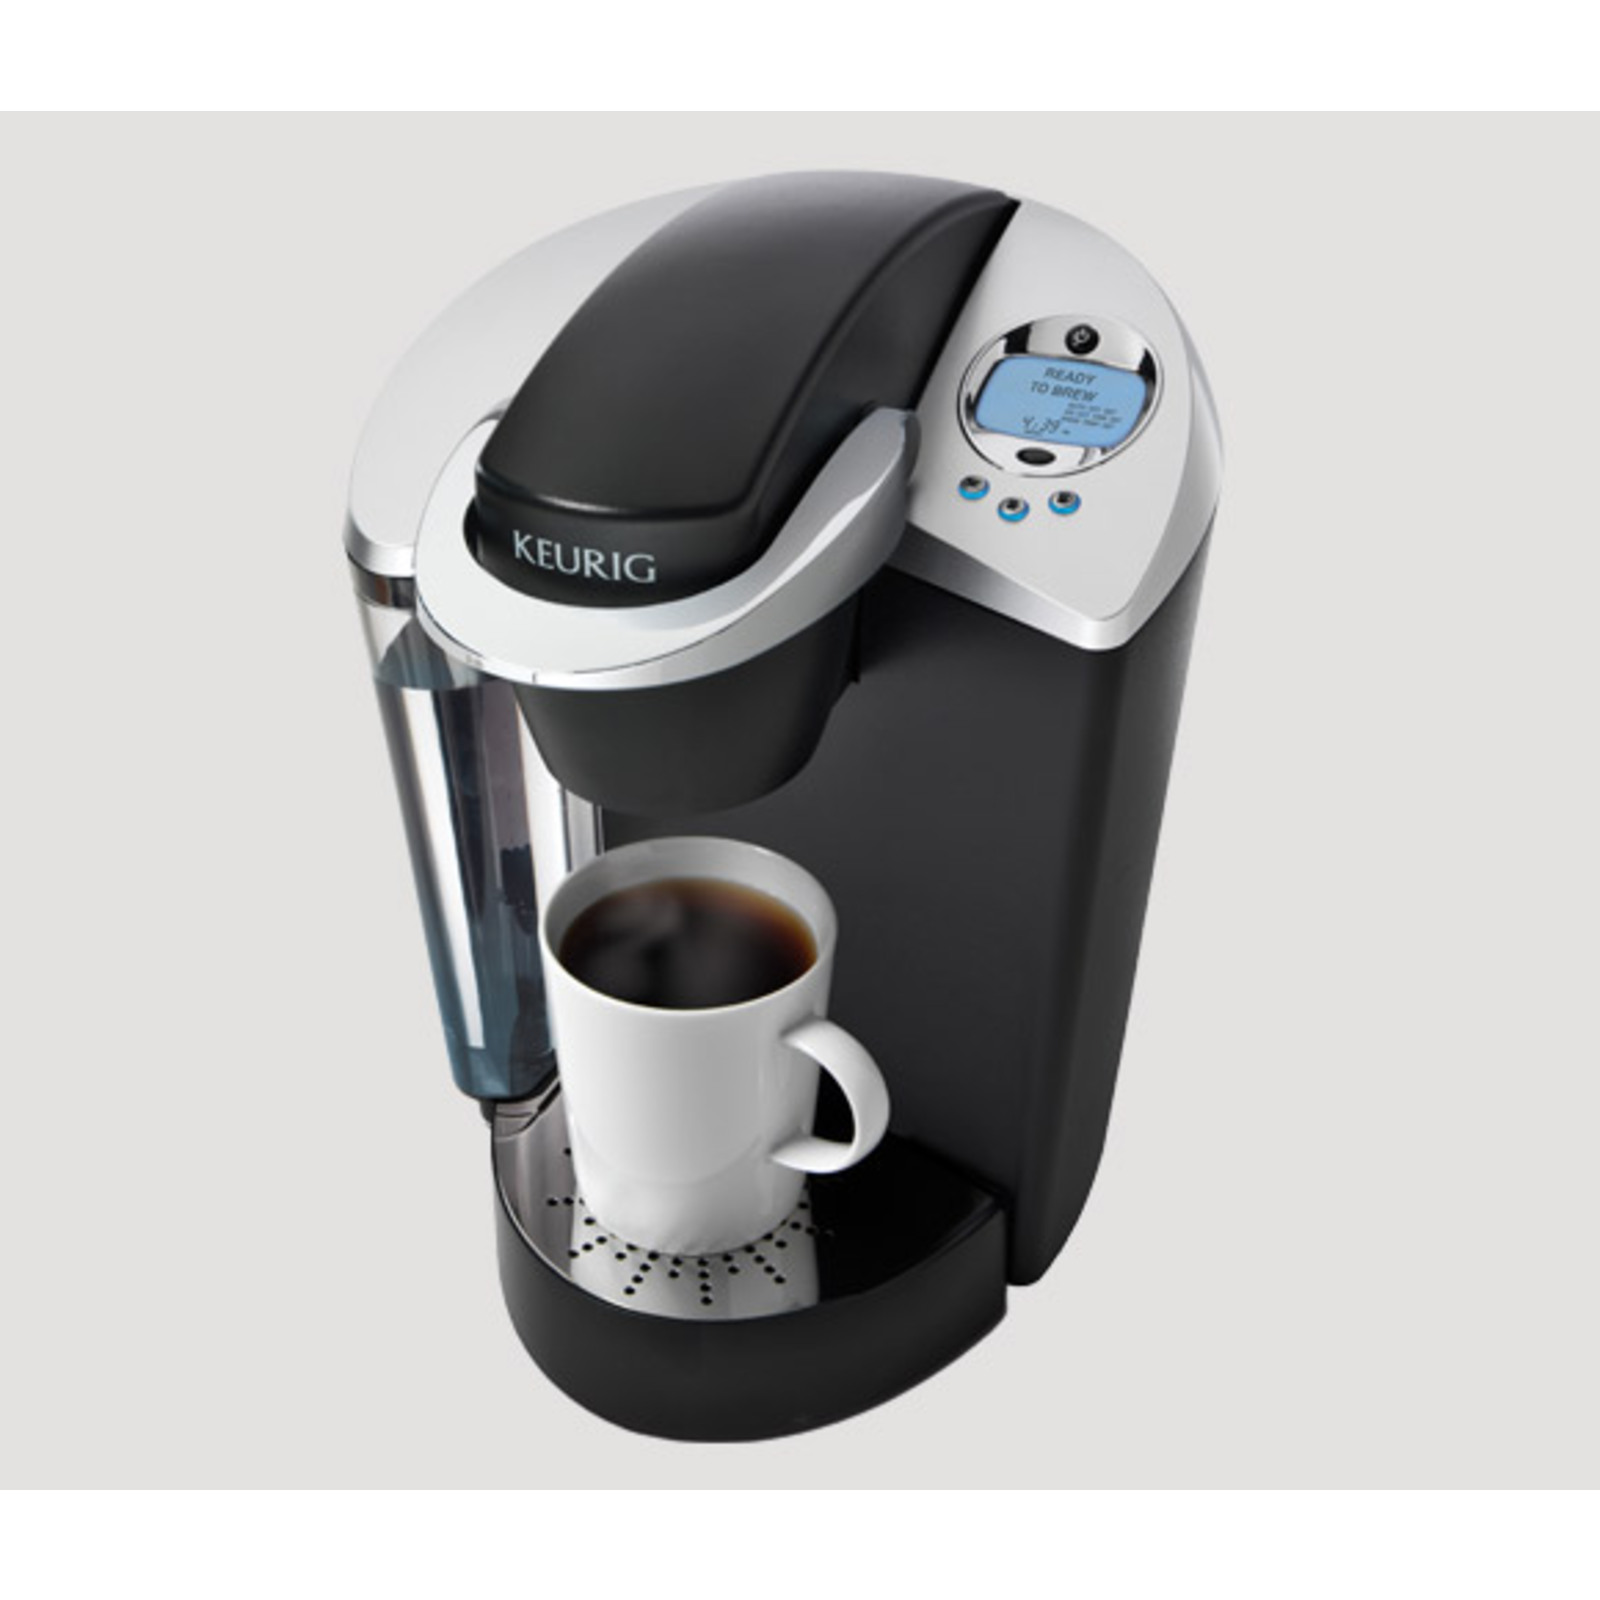 Keurig B60/K65 Special Edition Coffee Maker